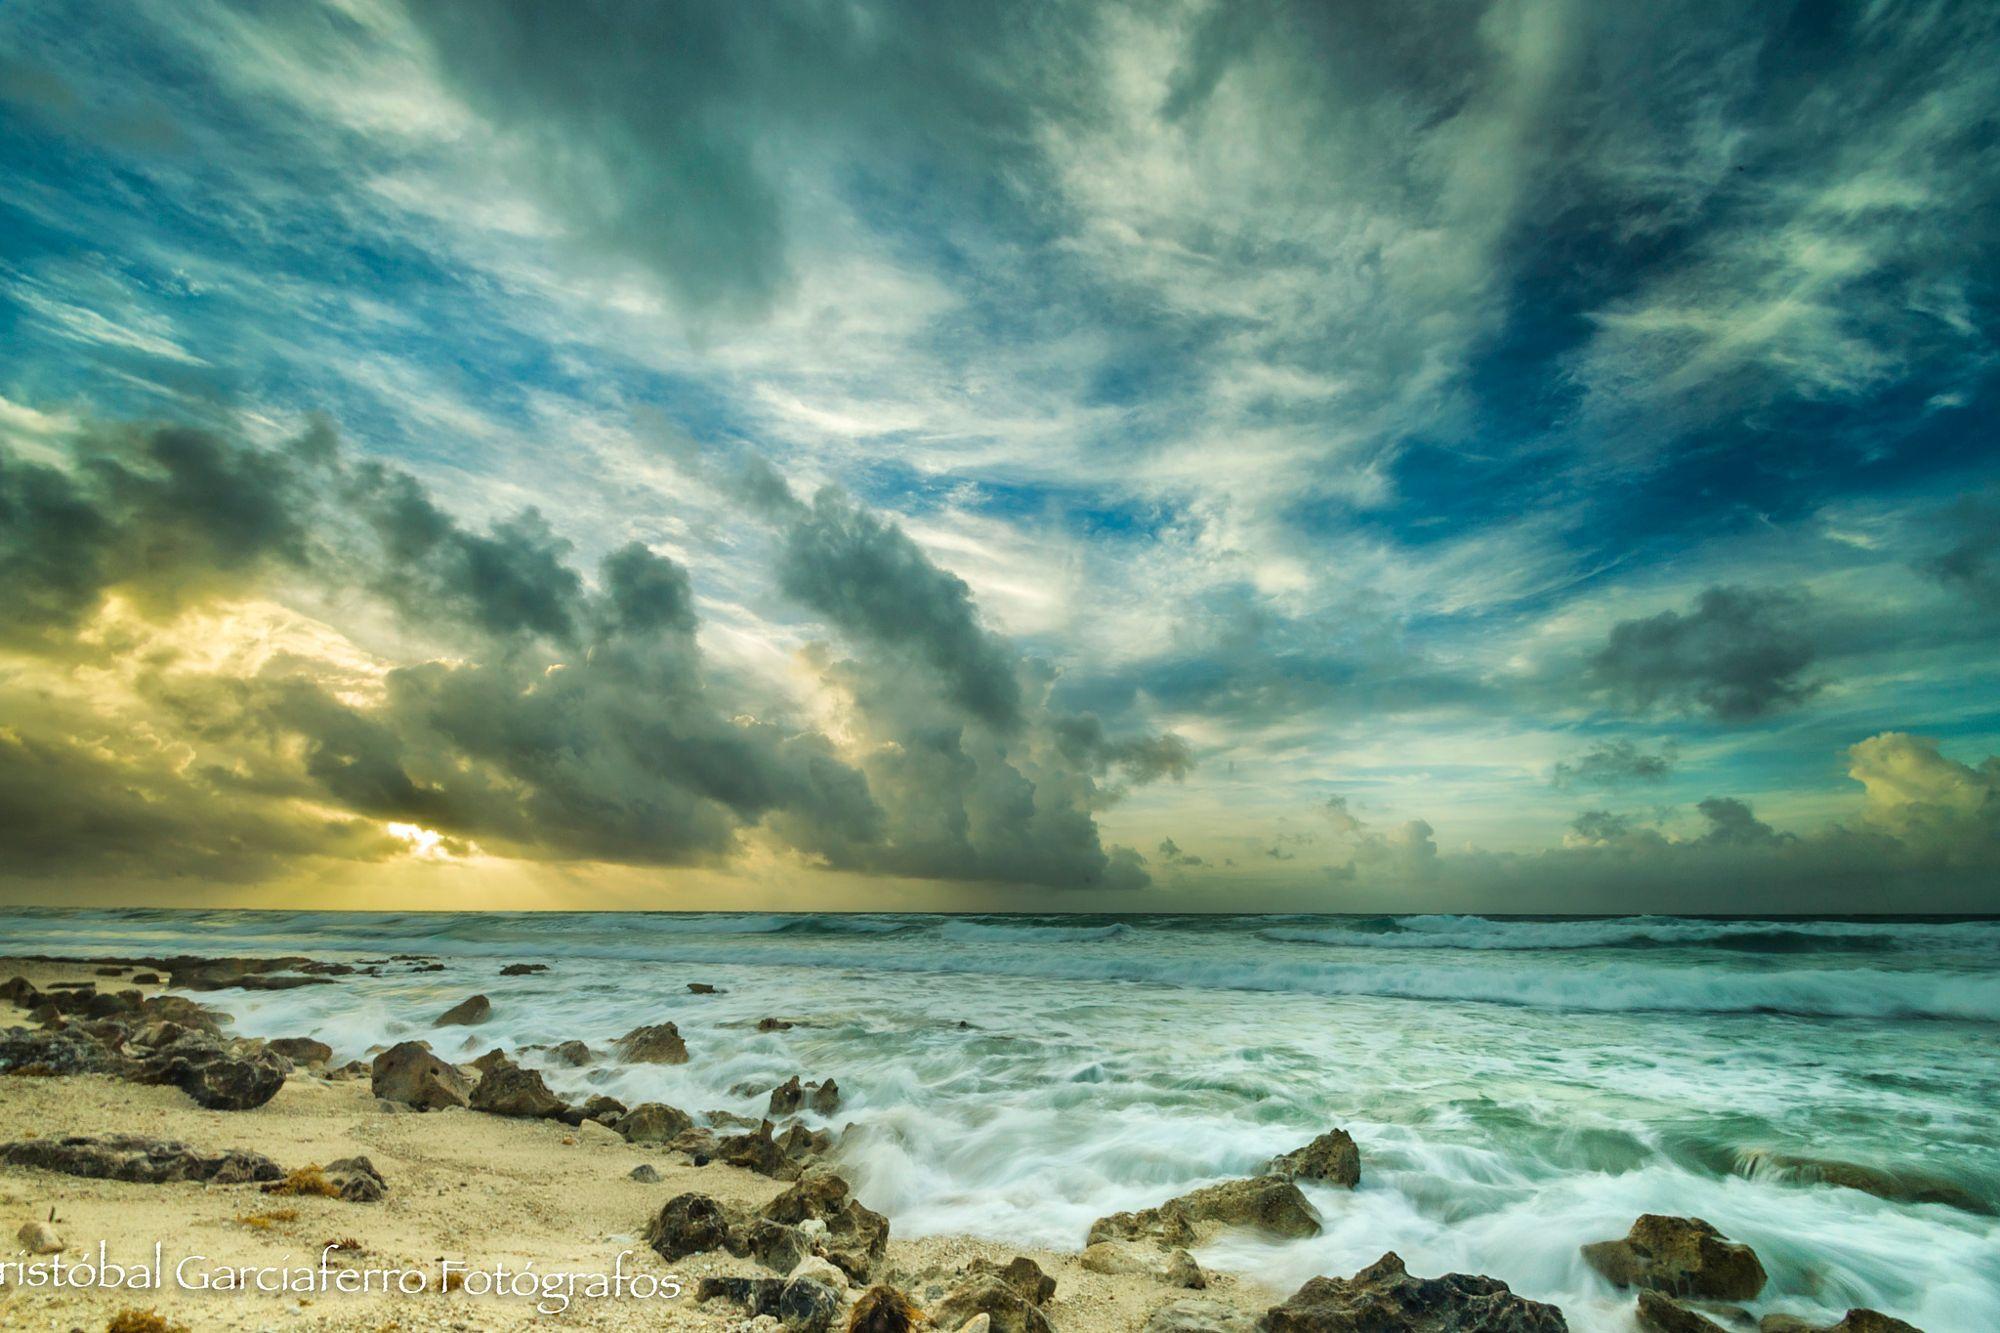 Sunrise beach wedding  Sunrise in Cozumel Landscapes photo by CristobalGarciaferroRubio